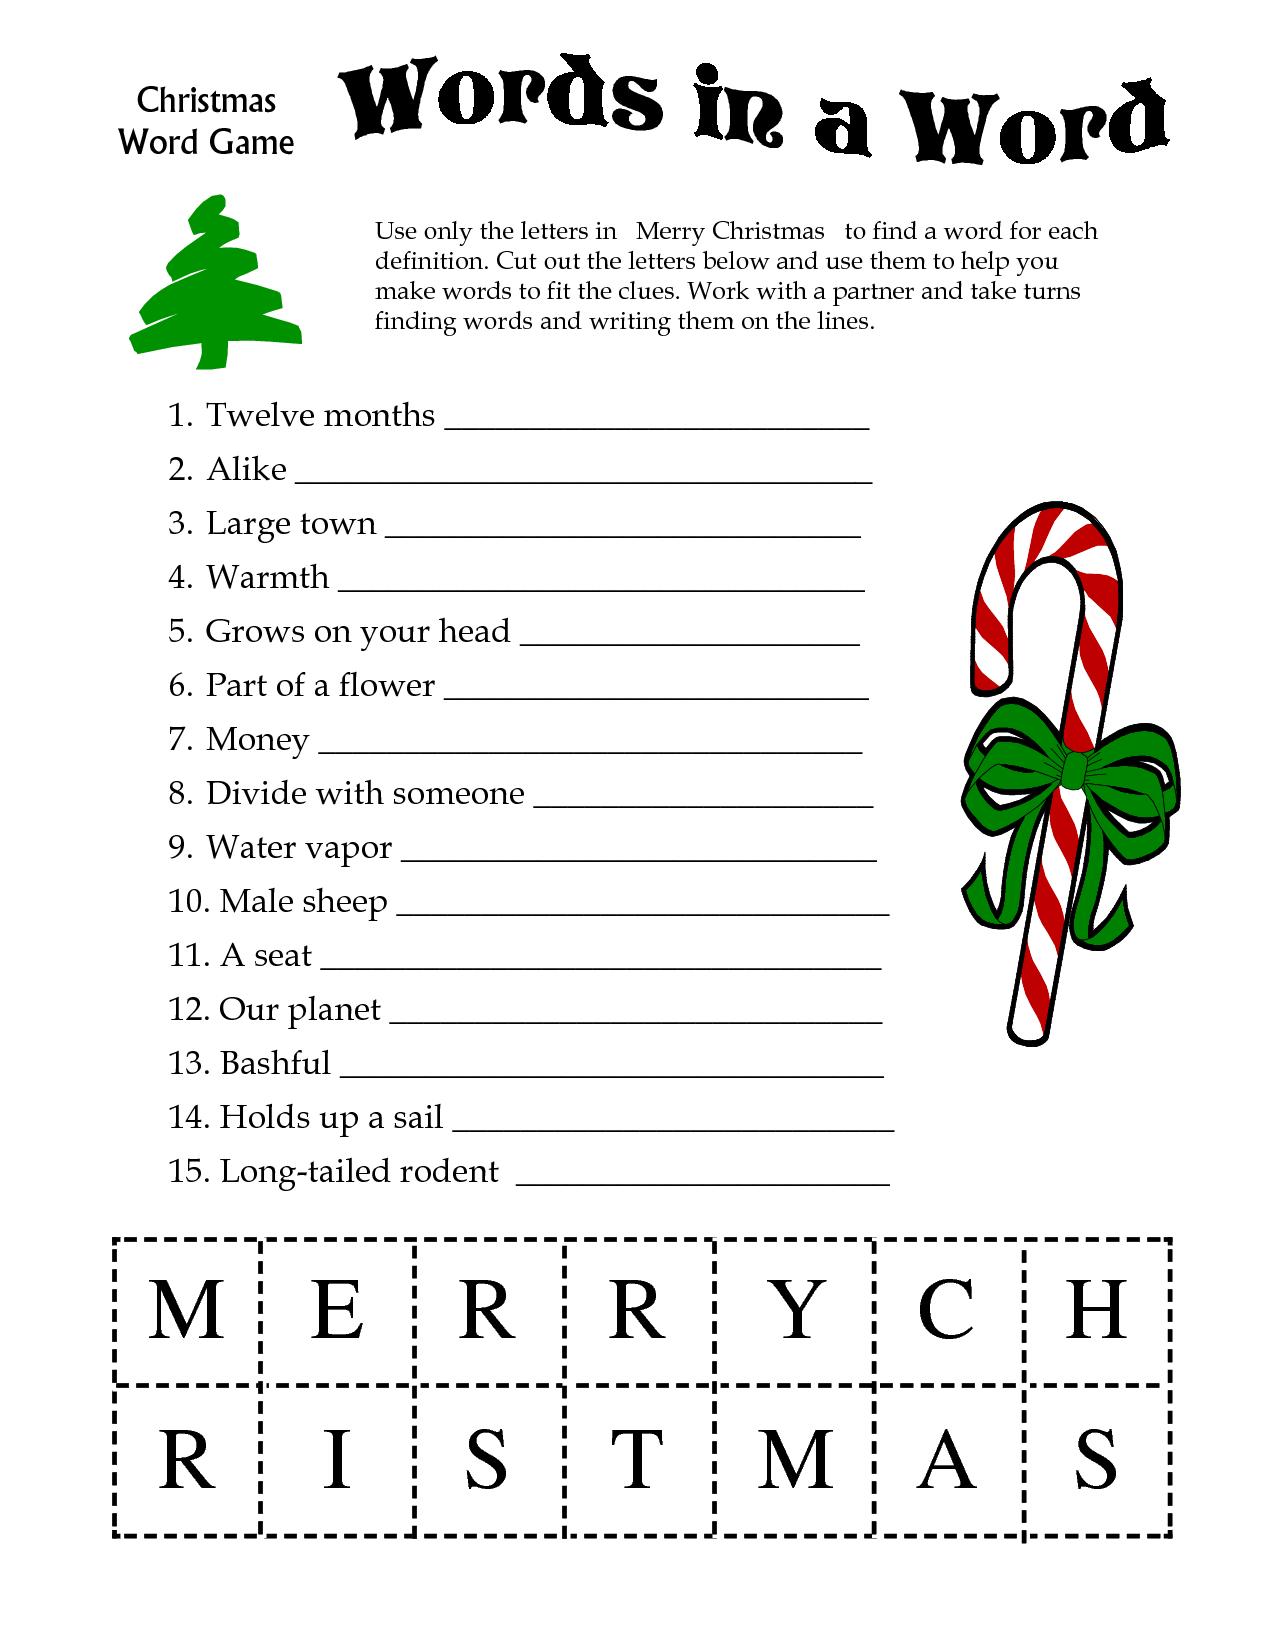 5 Images Of Free Printable Christmas Word Games | Printablee - Christmas Song Scramble Free Printable